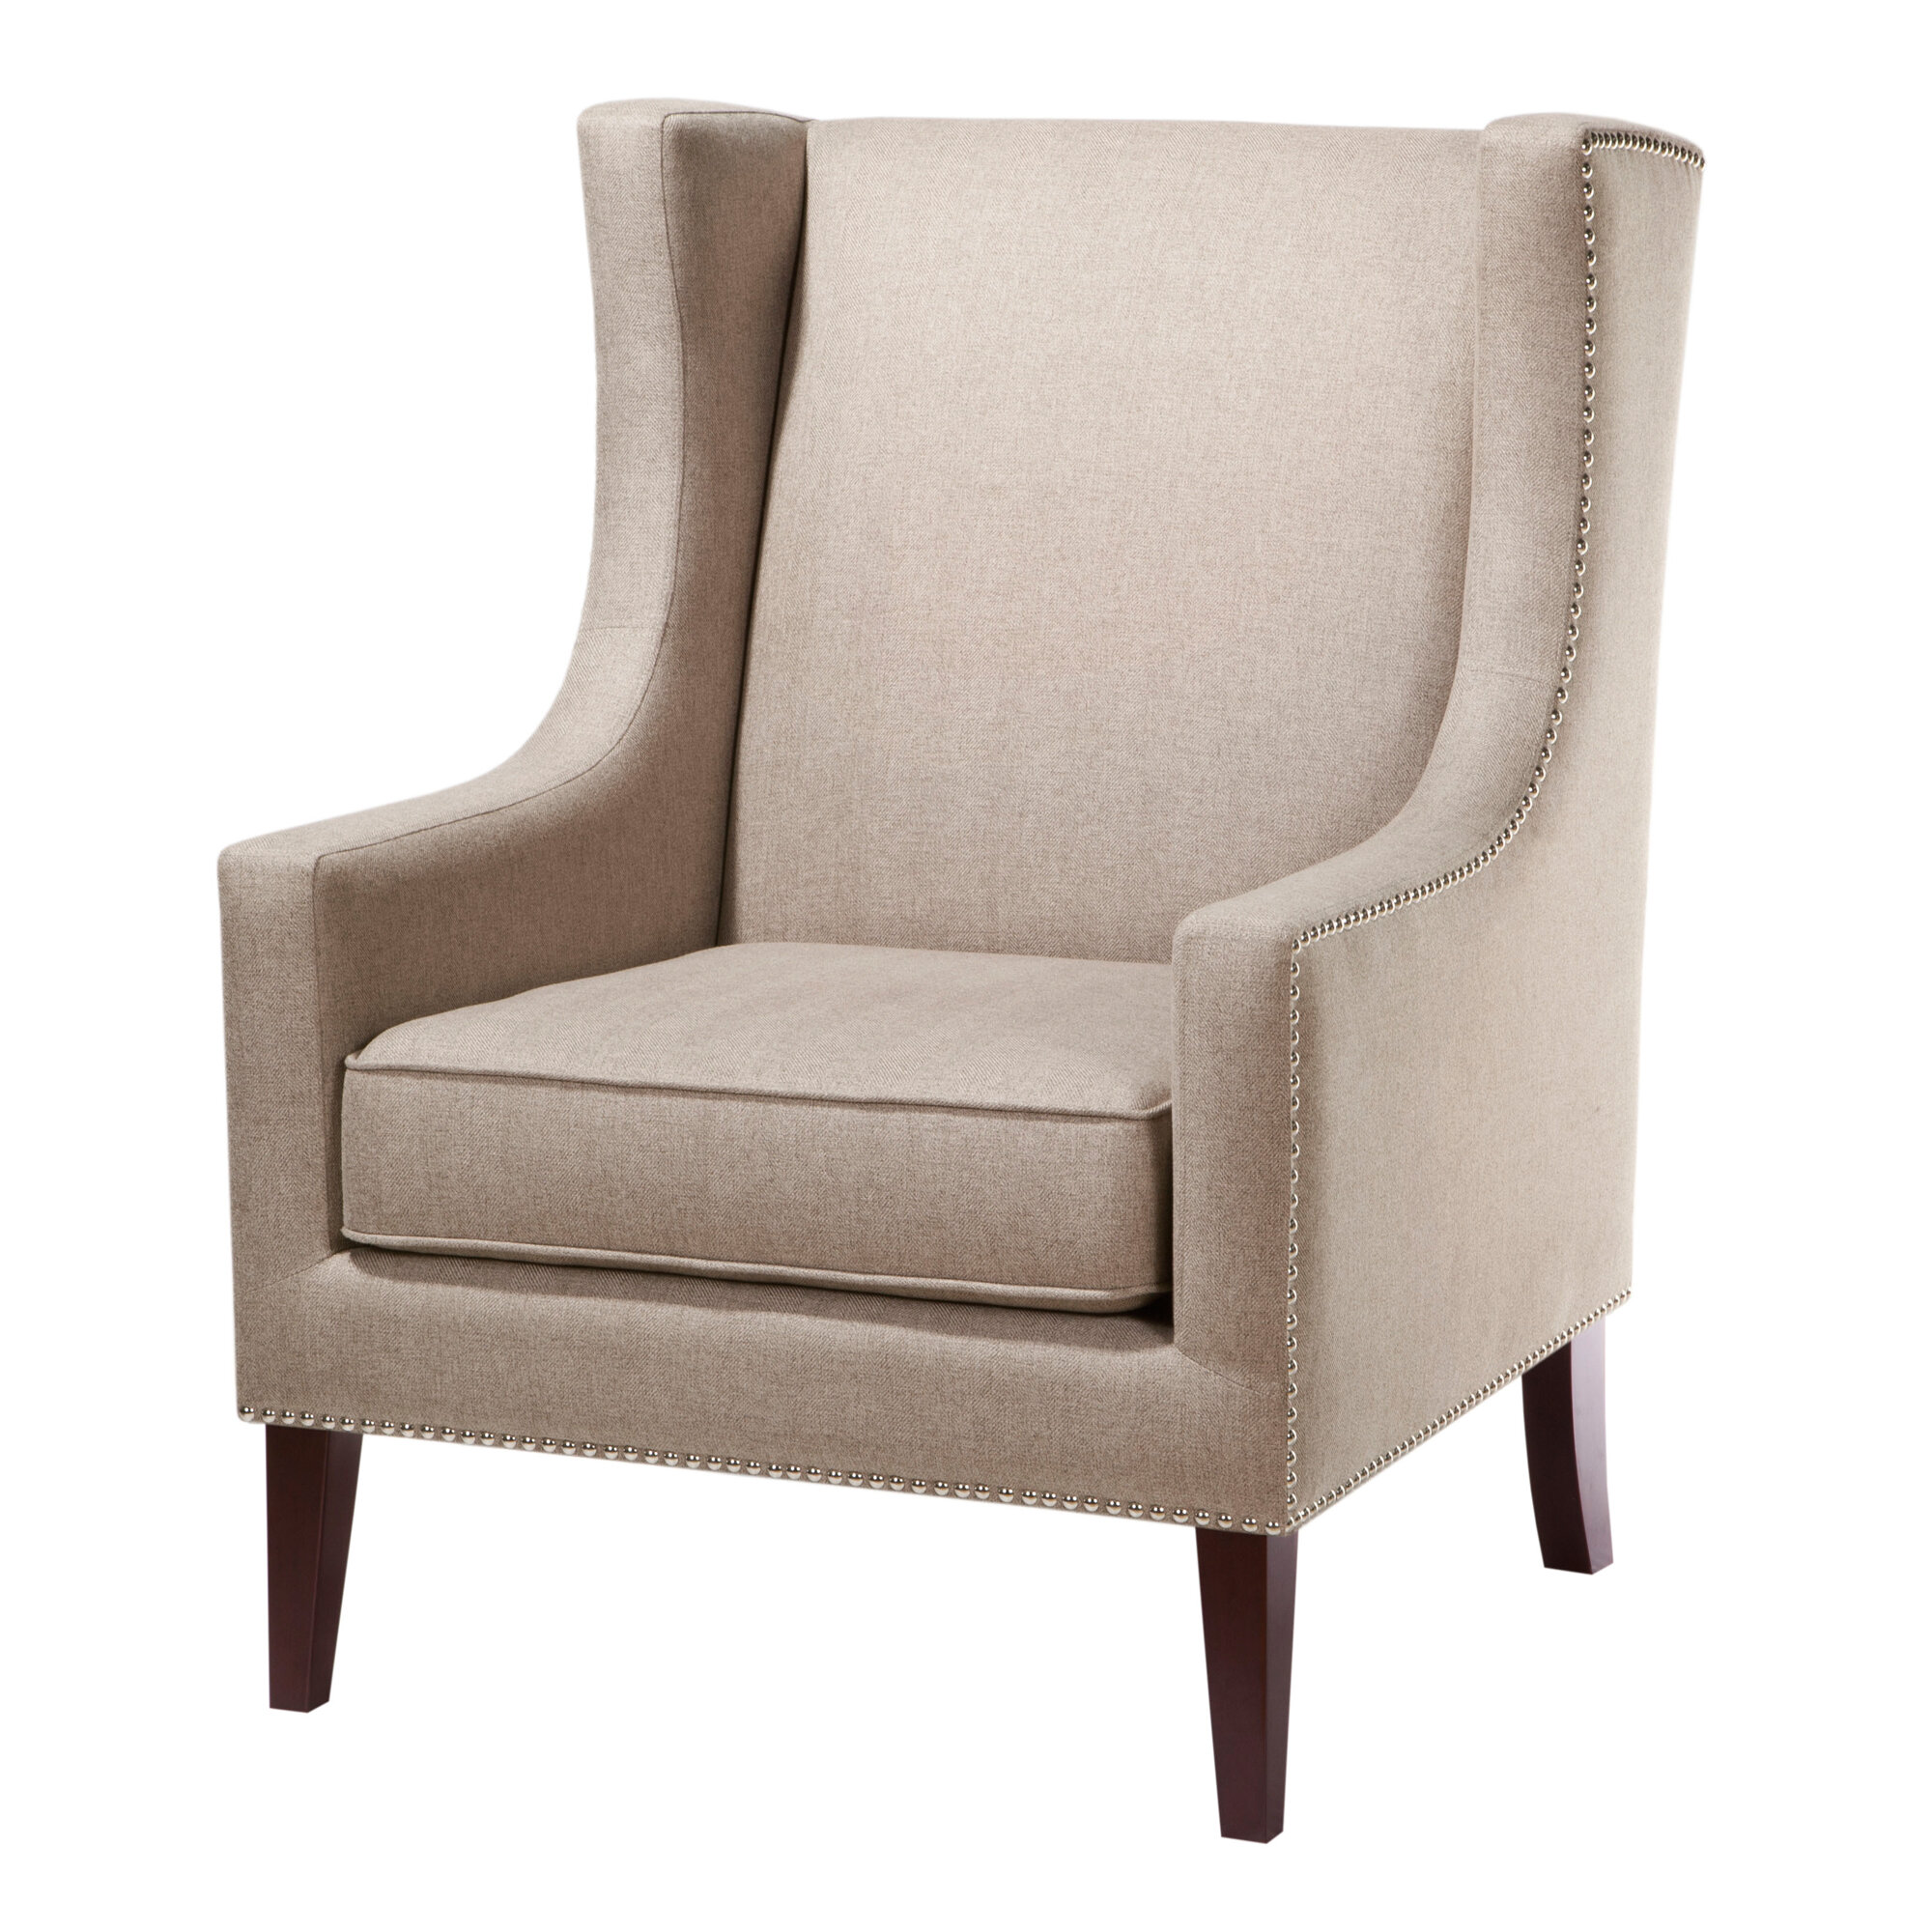 25b0f0fae1b Accent Chairs